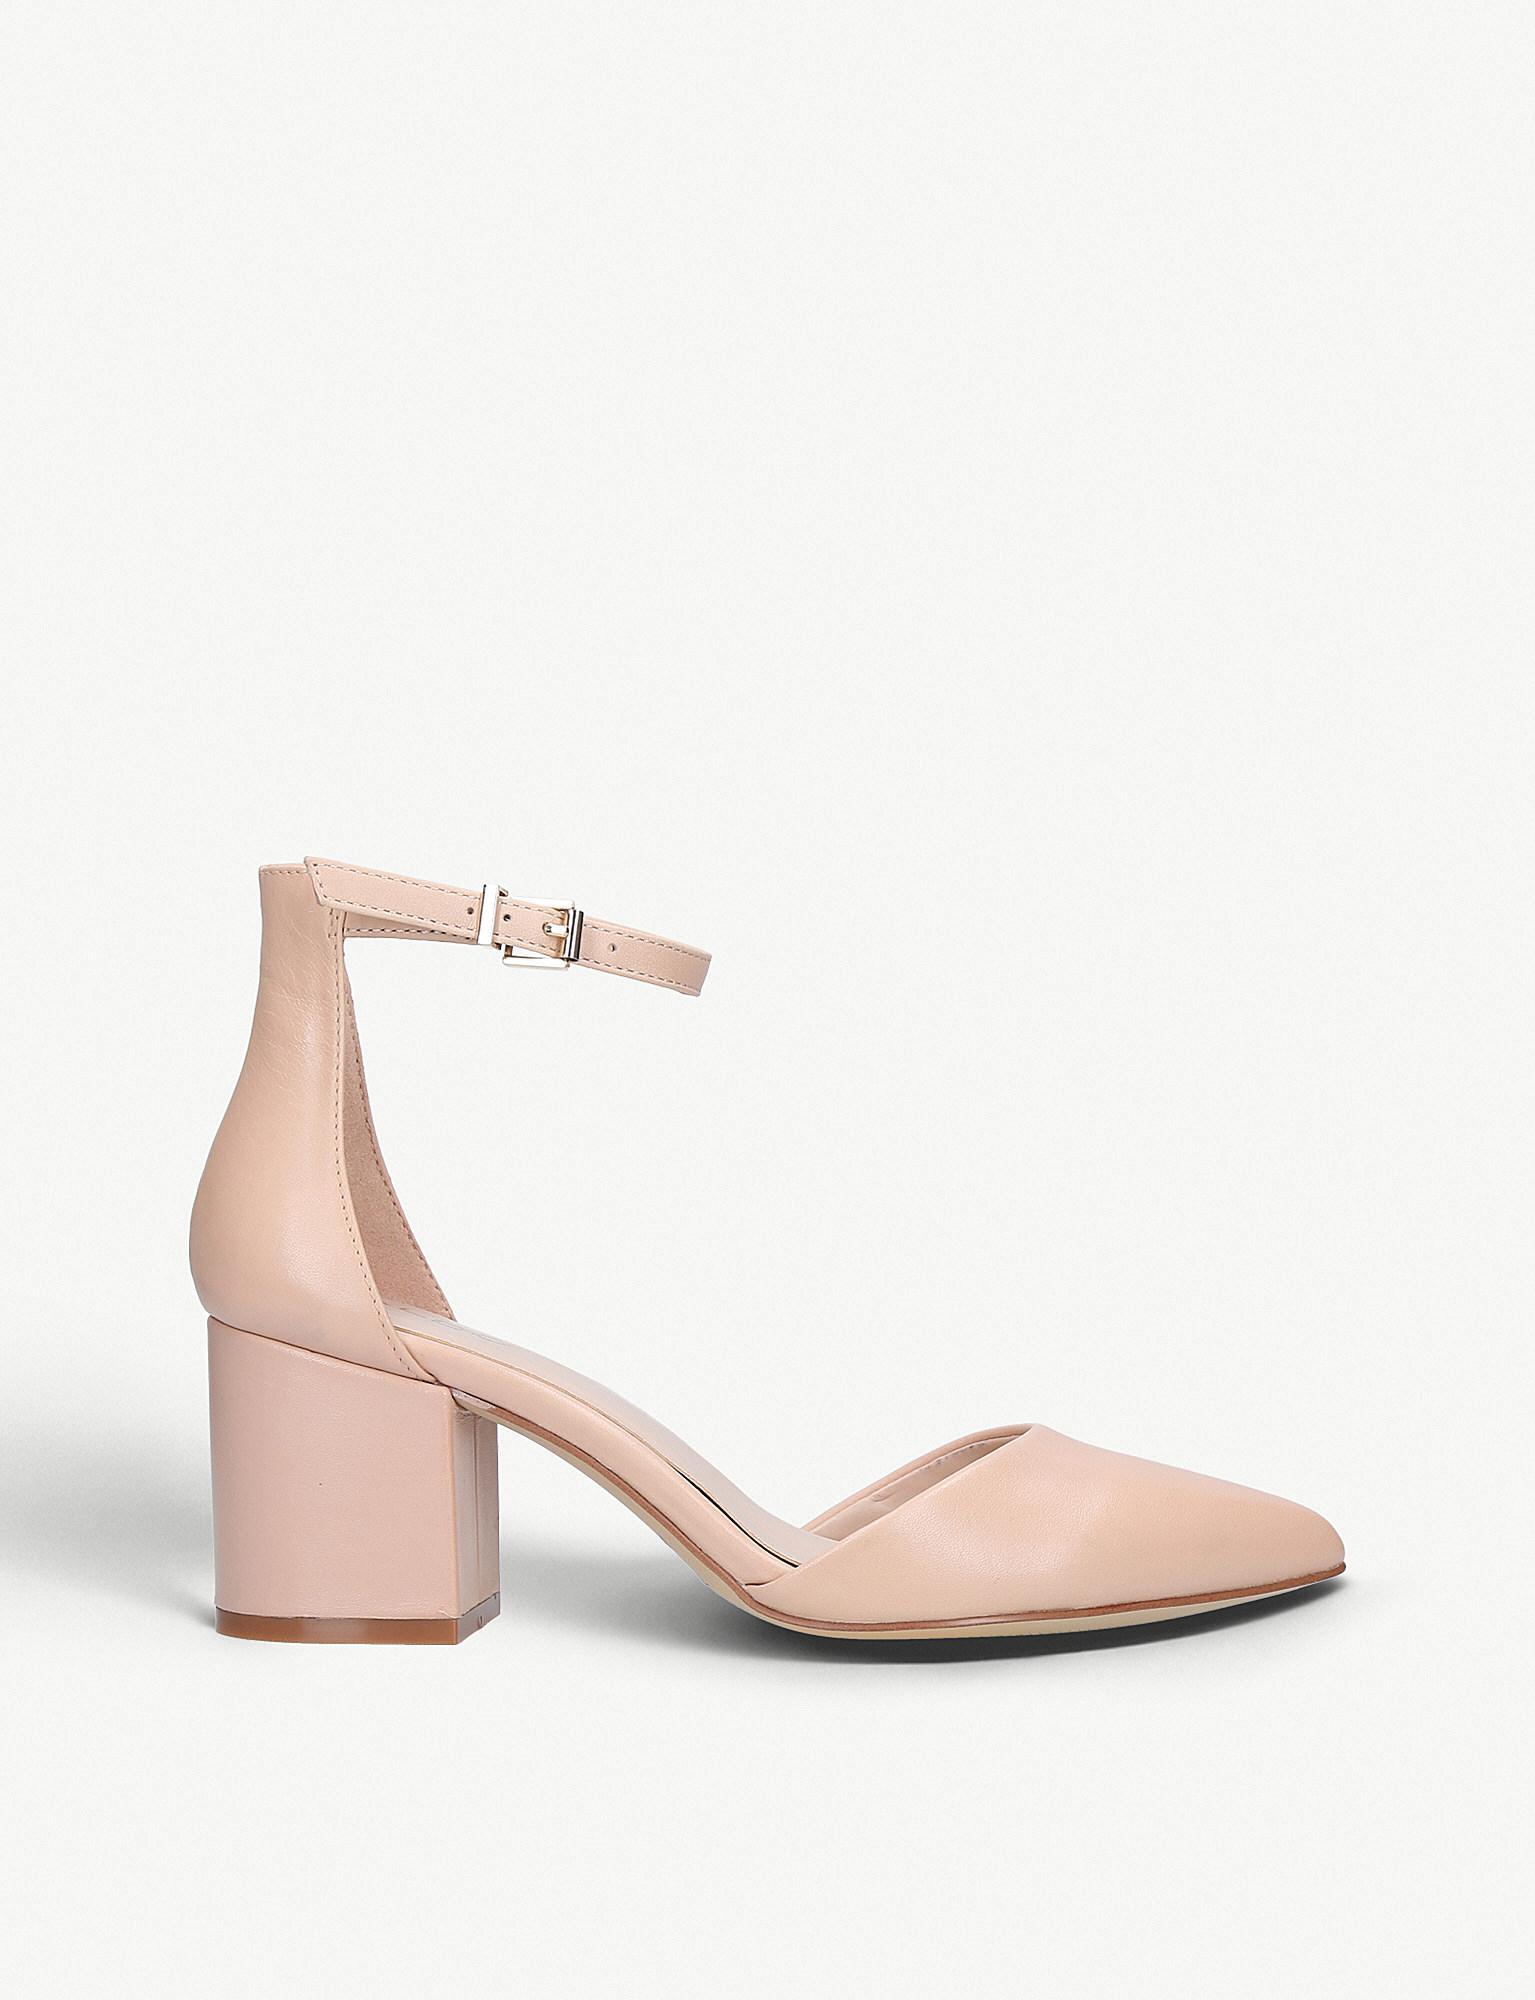 1b7bb94519c Lyst - ALDO Keclya Leather Sandals in Pink